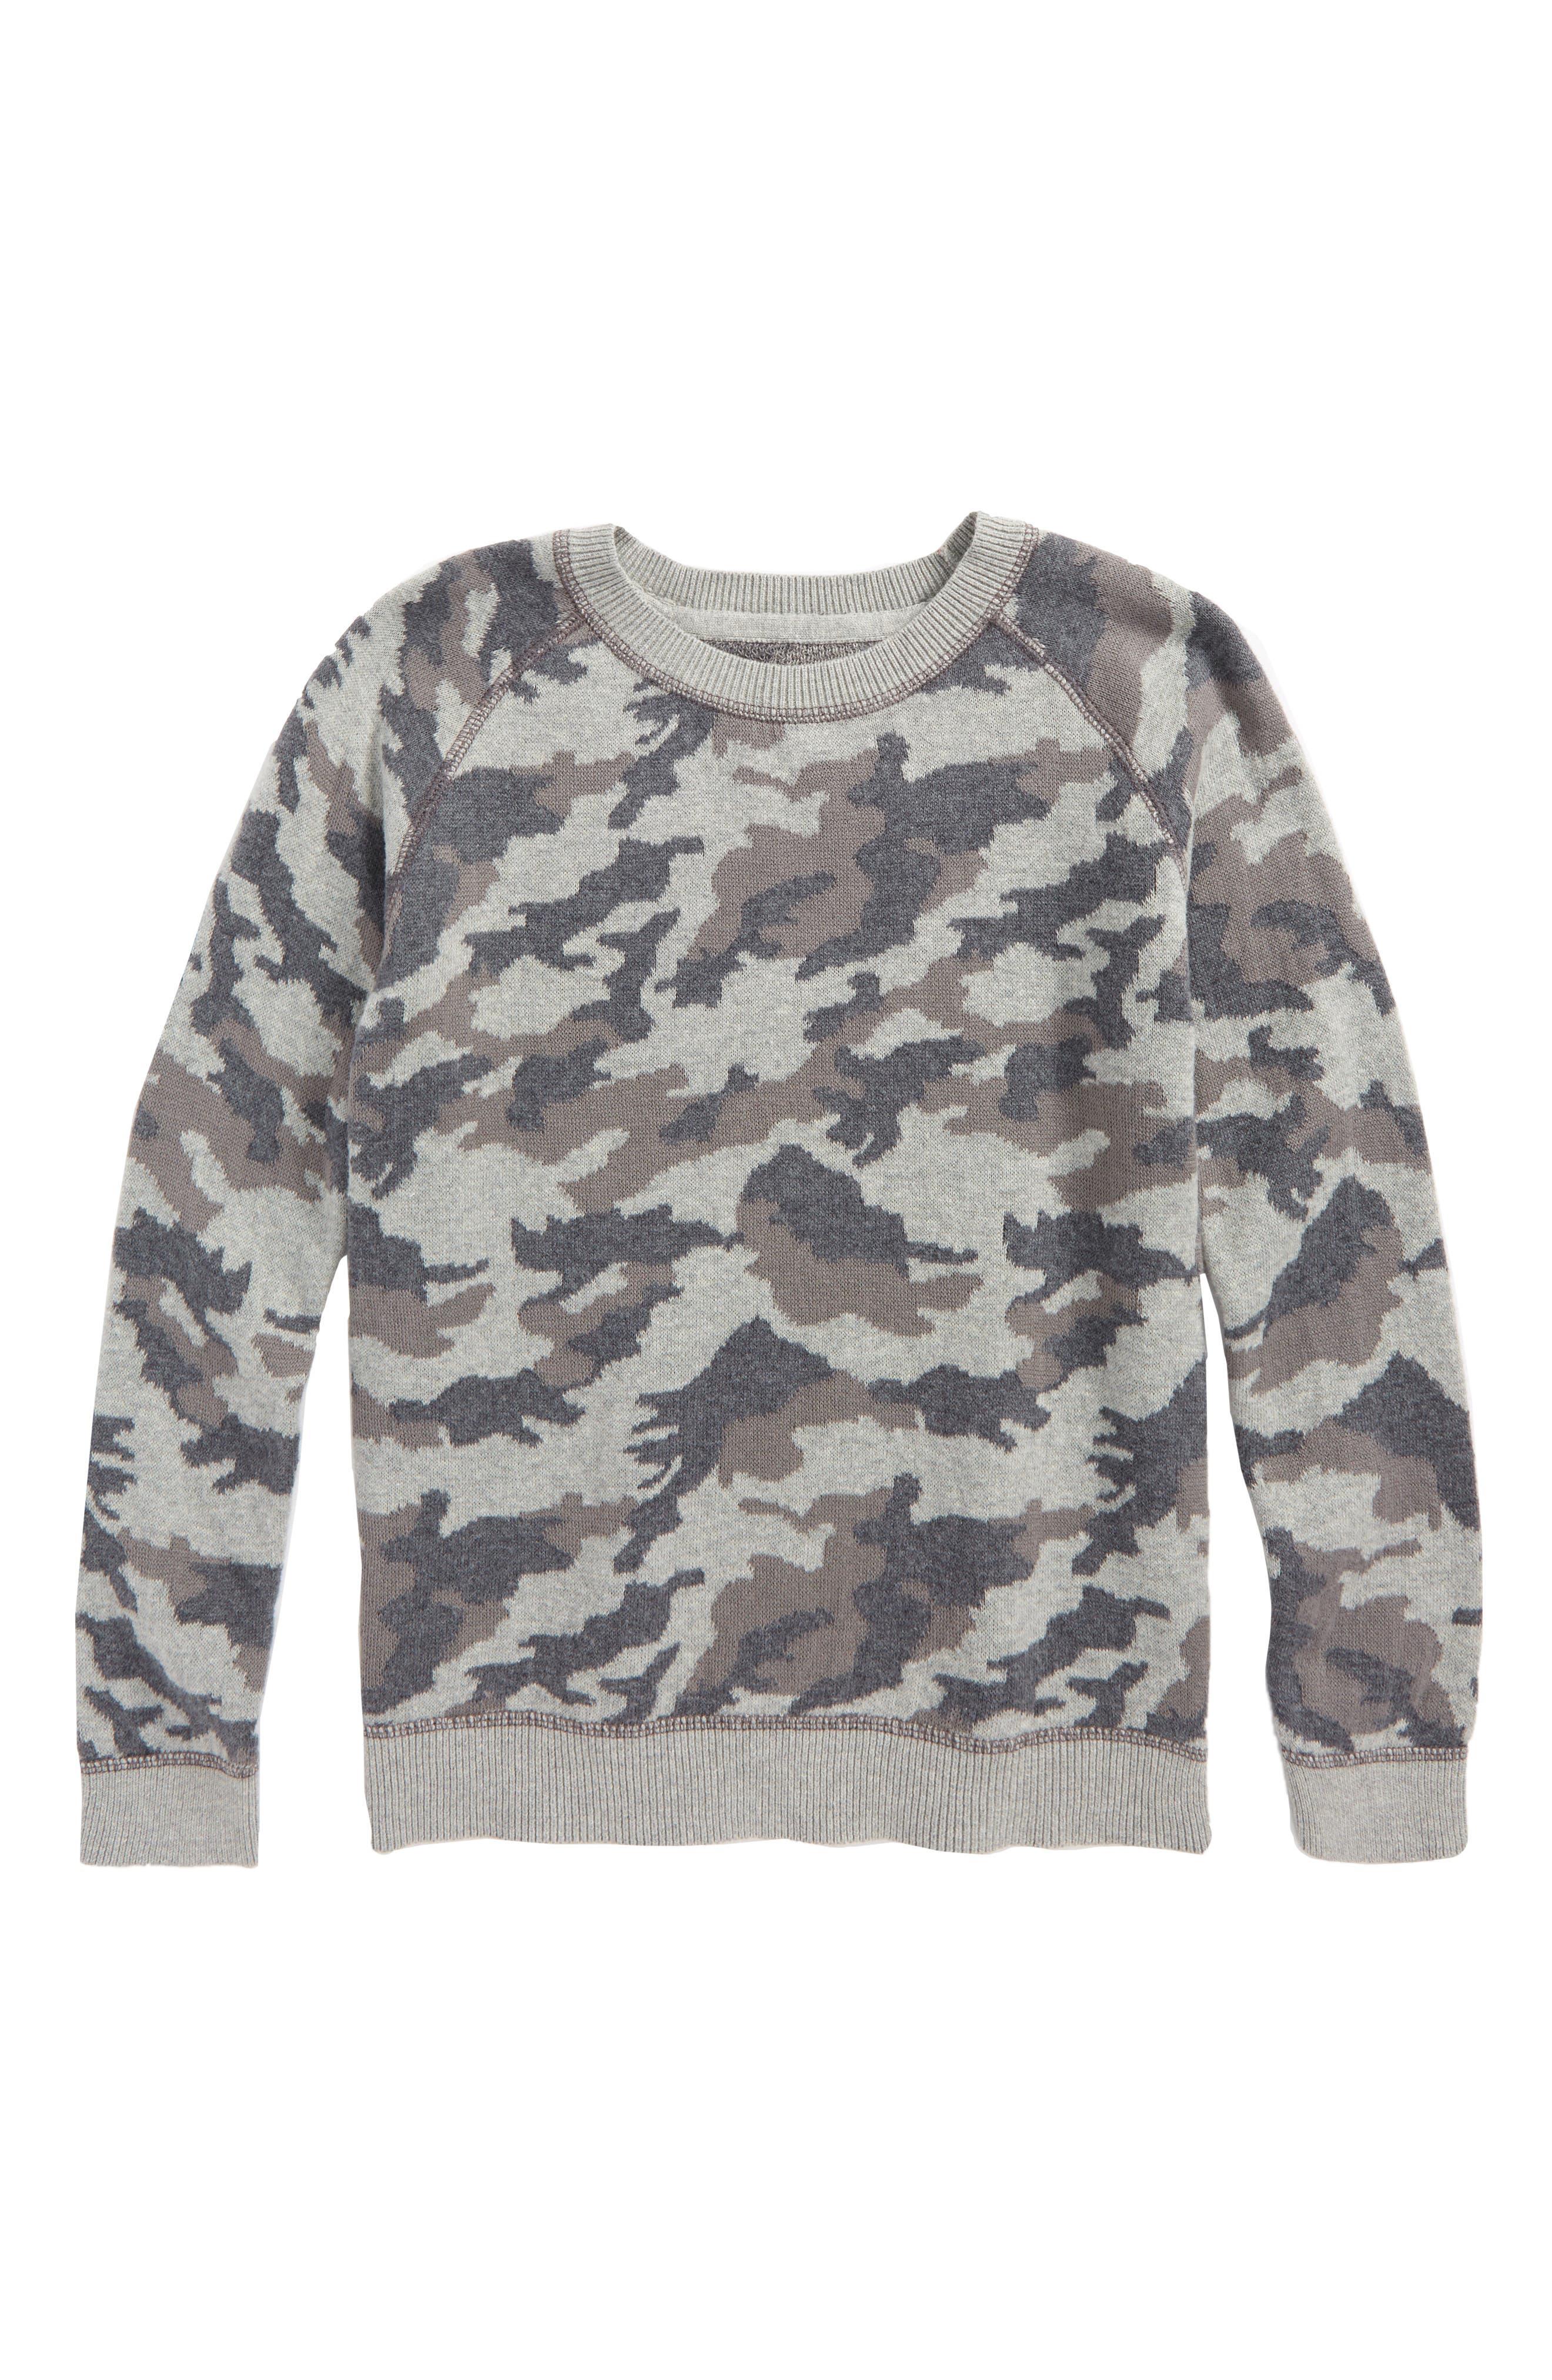 Main Image - Tucker + Tate Camo Print Sweater (Toddler Boys & Little Boys)